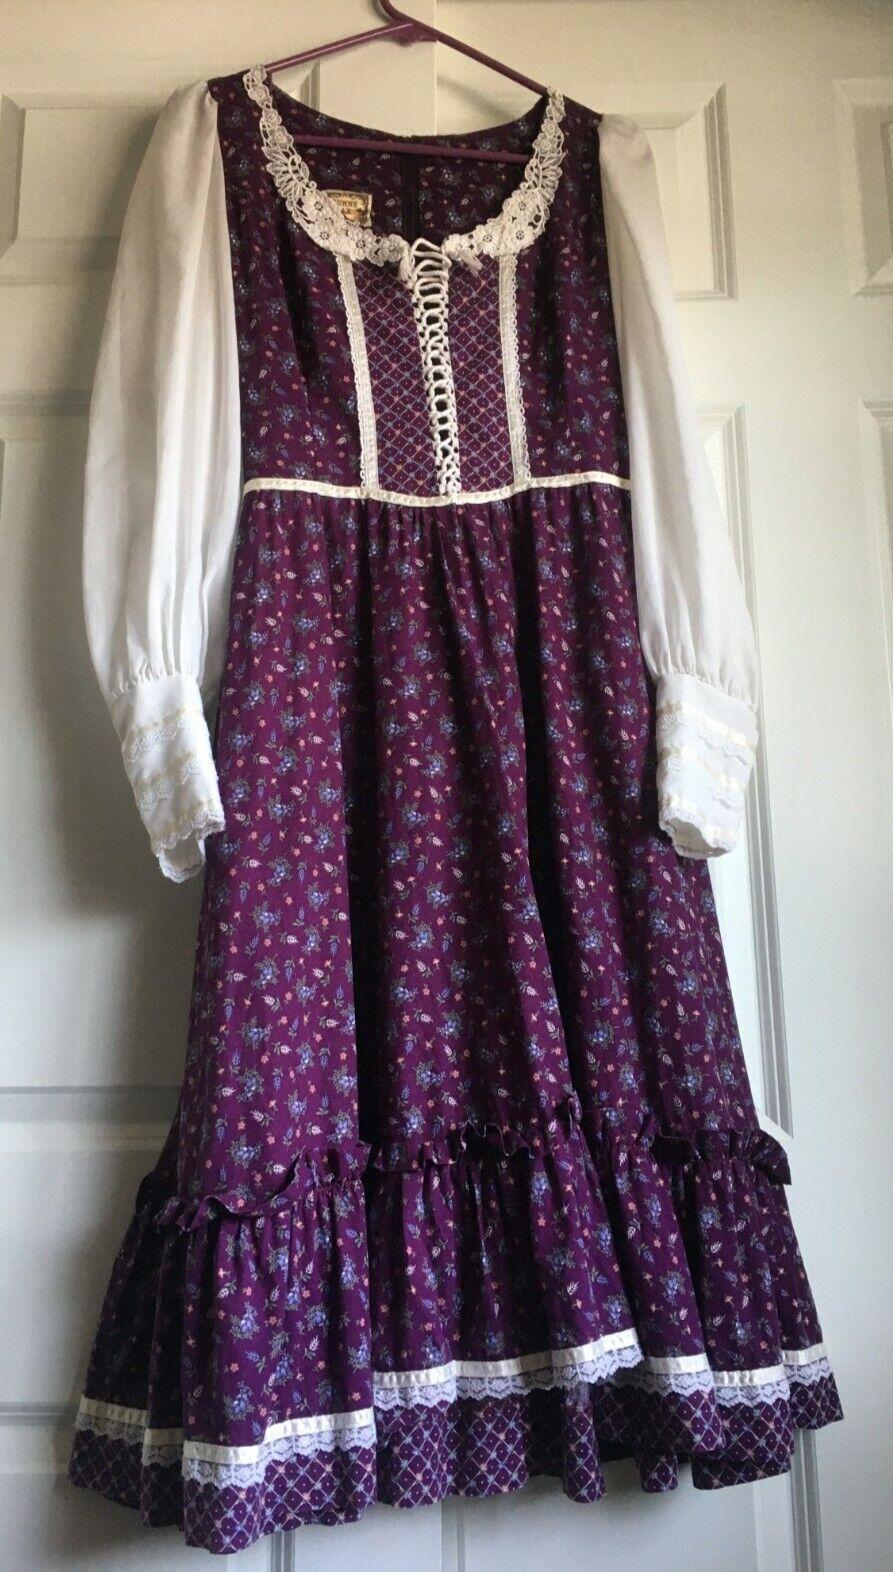 Vintage 1970's Gunne Sax RARE LARGE SIZE 13 Prairie Revival Dress Purple Floral